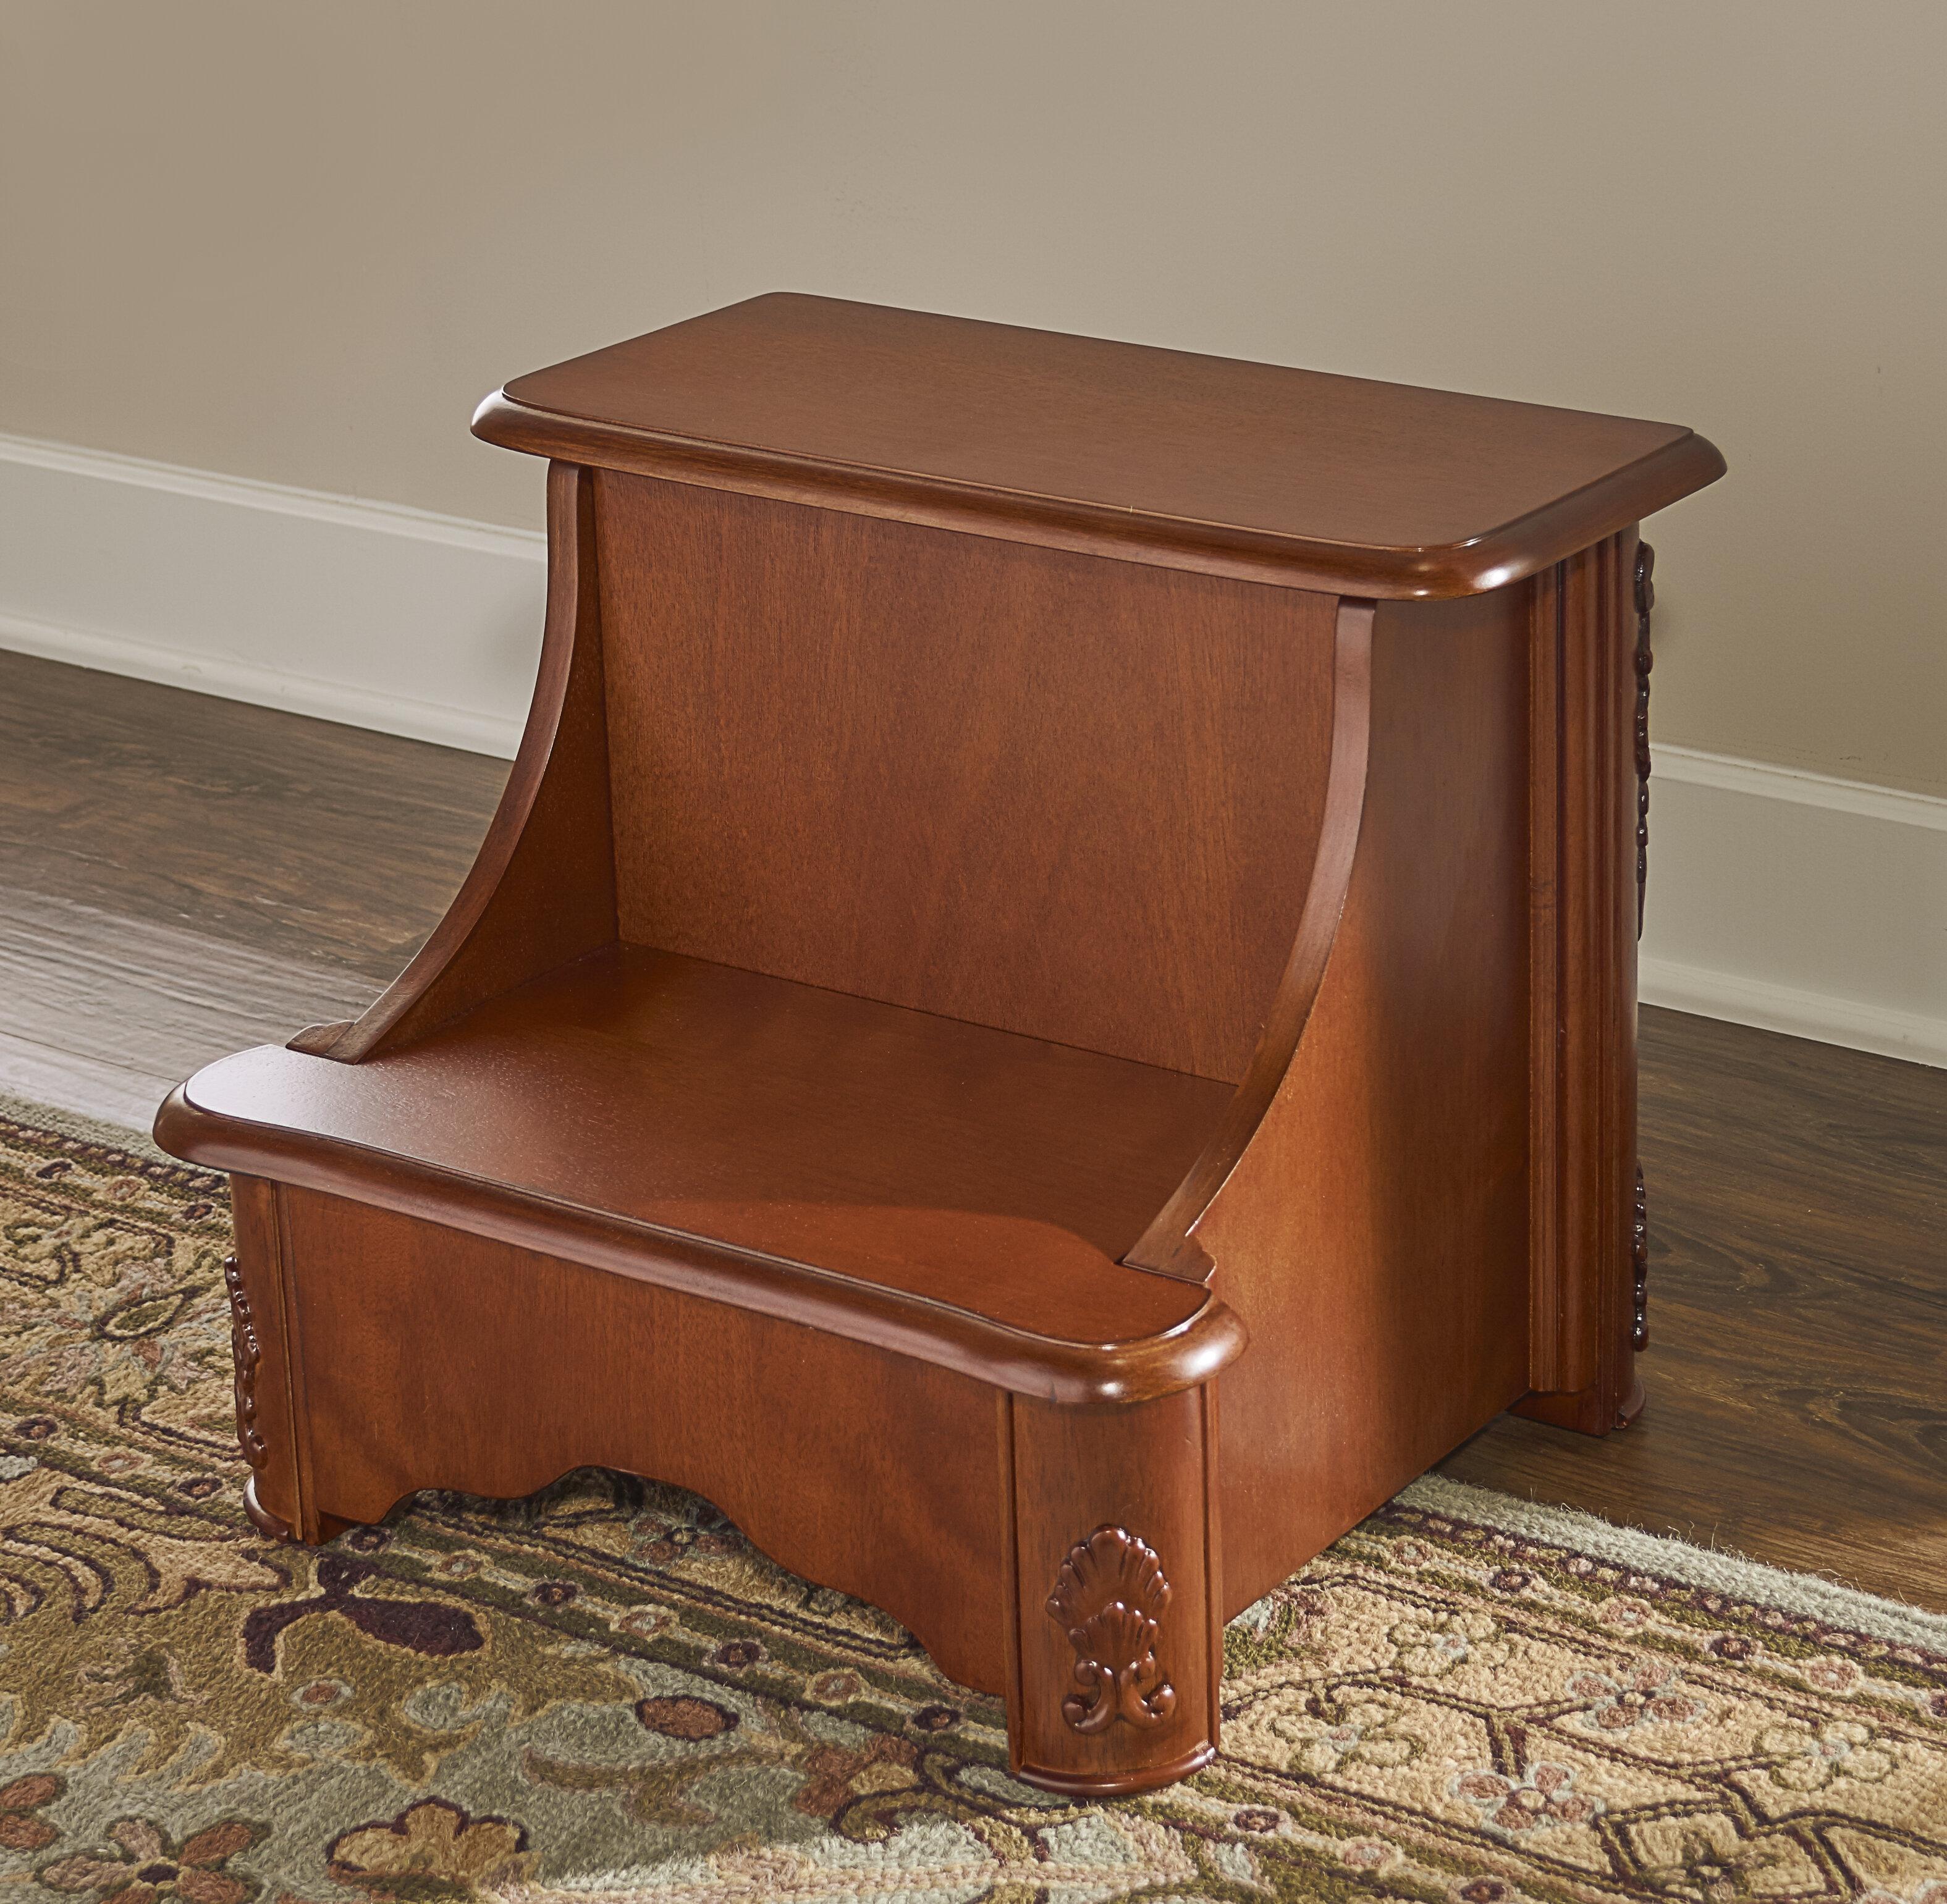 Powell Woodbury Mahogany 2 Step Manufactured Wood Bed Stool With 200 Lb Load Capacity Reviews Wayfair